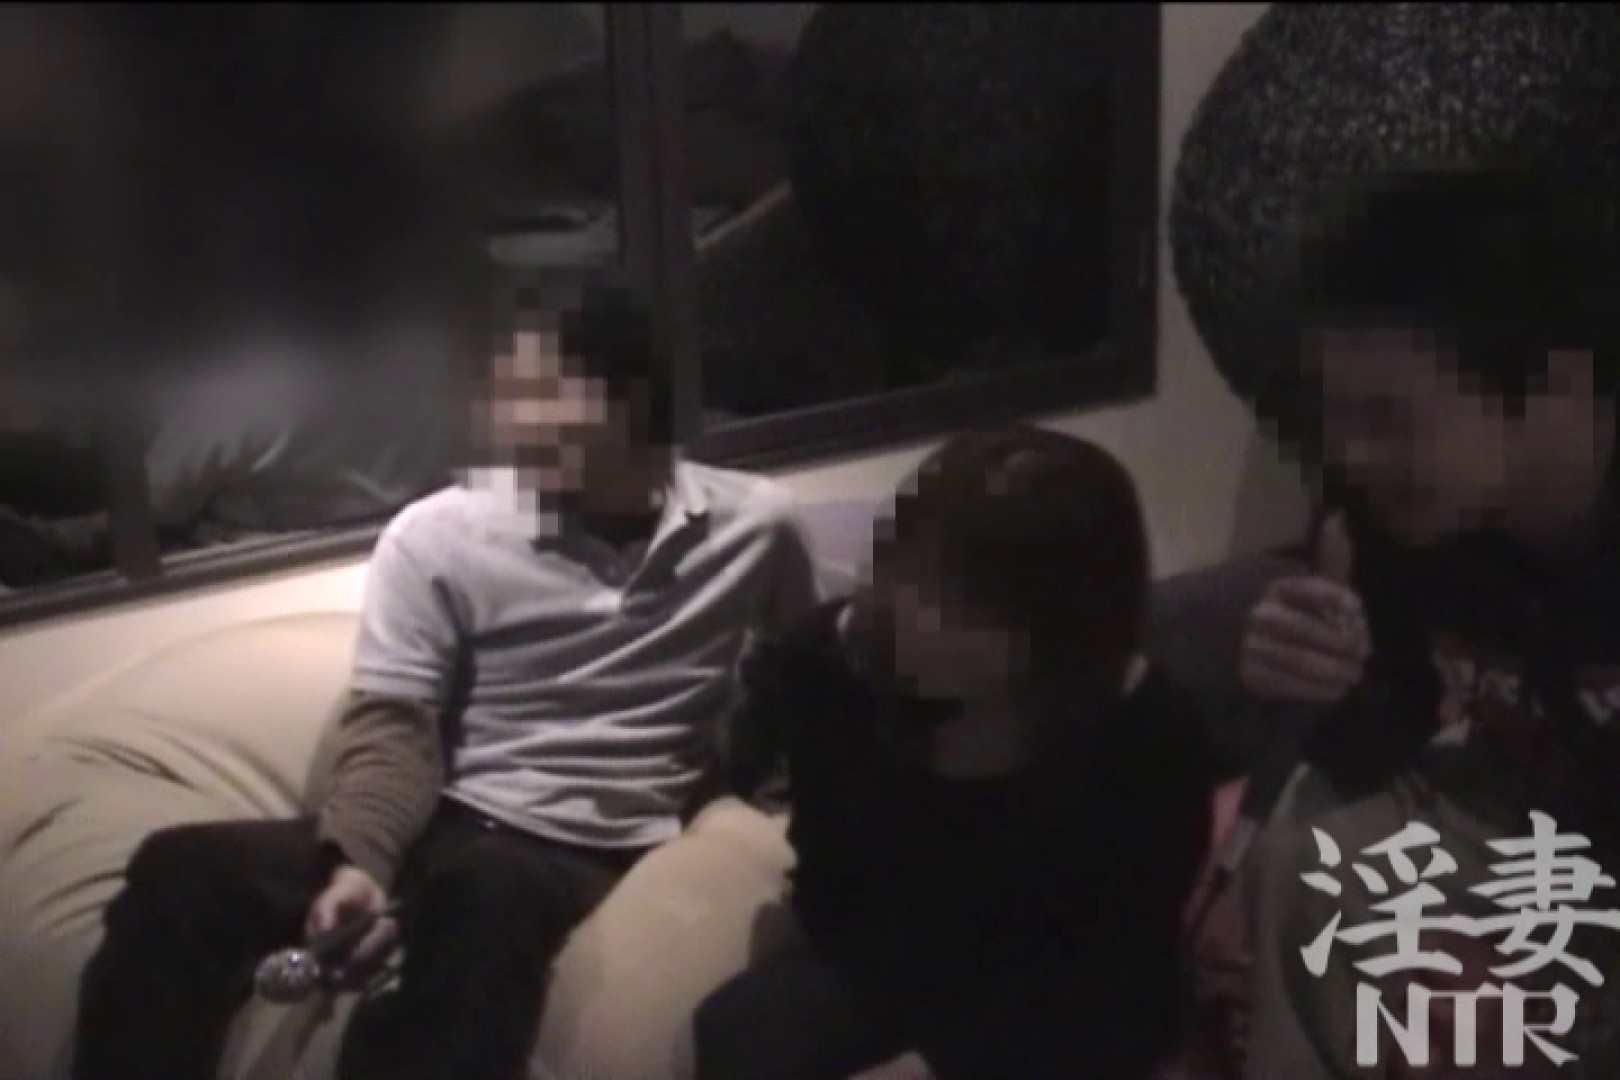 淫乱彩女 麻優里 彼氏2人と旦那の同僚と 他人棒 性交動画流出 80pic 3